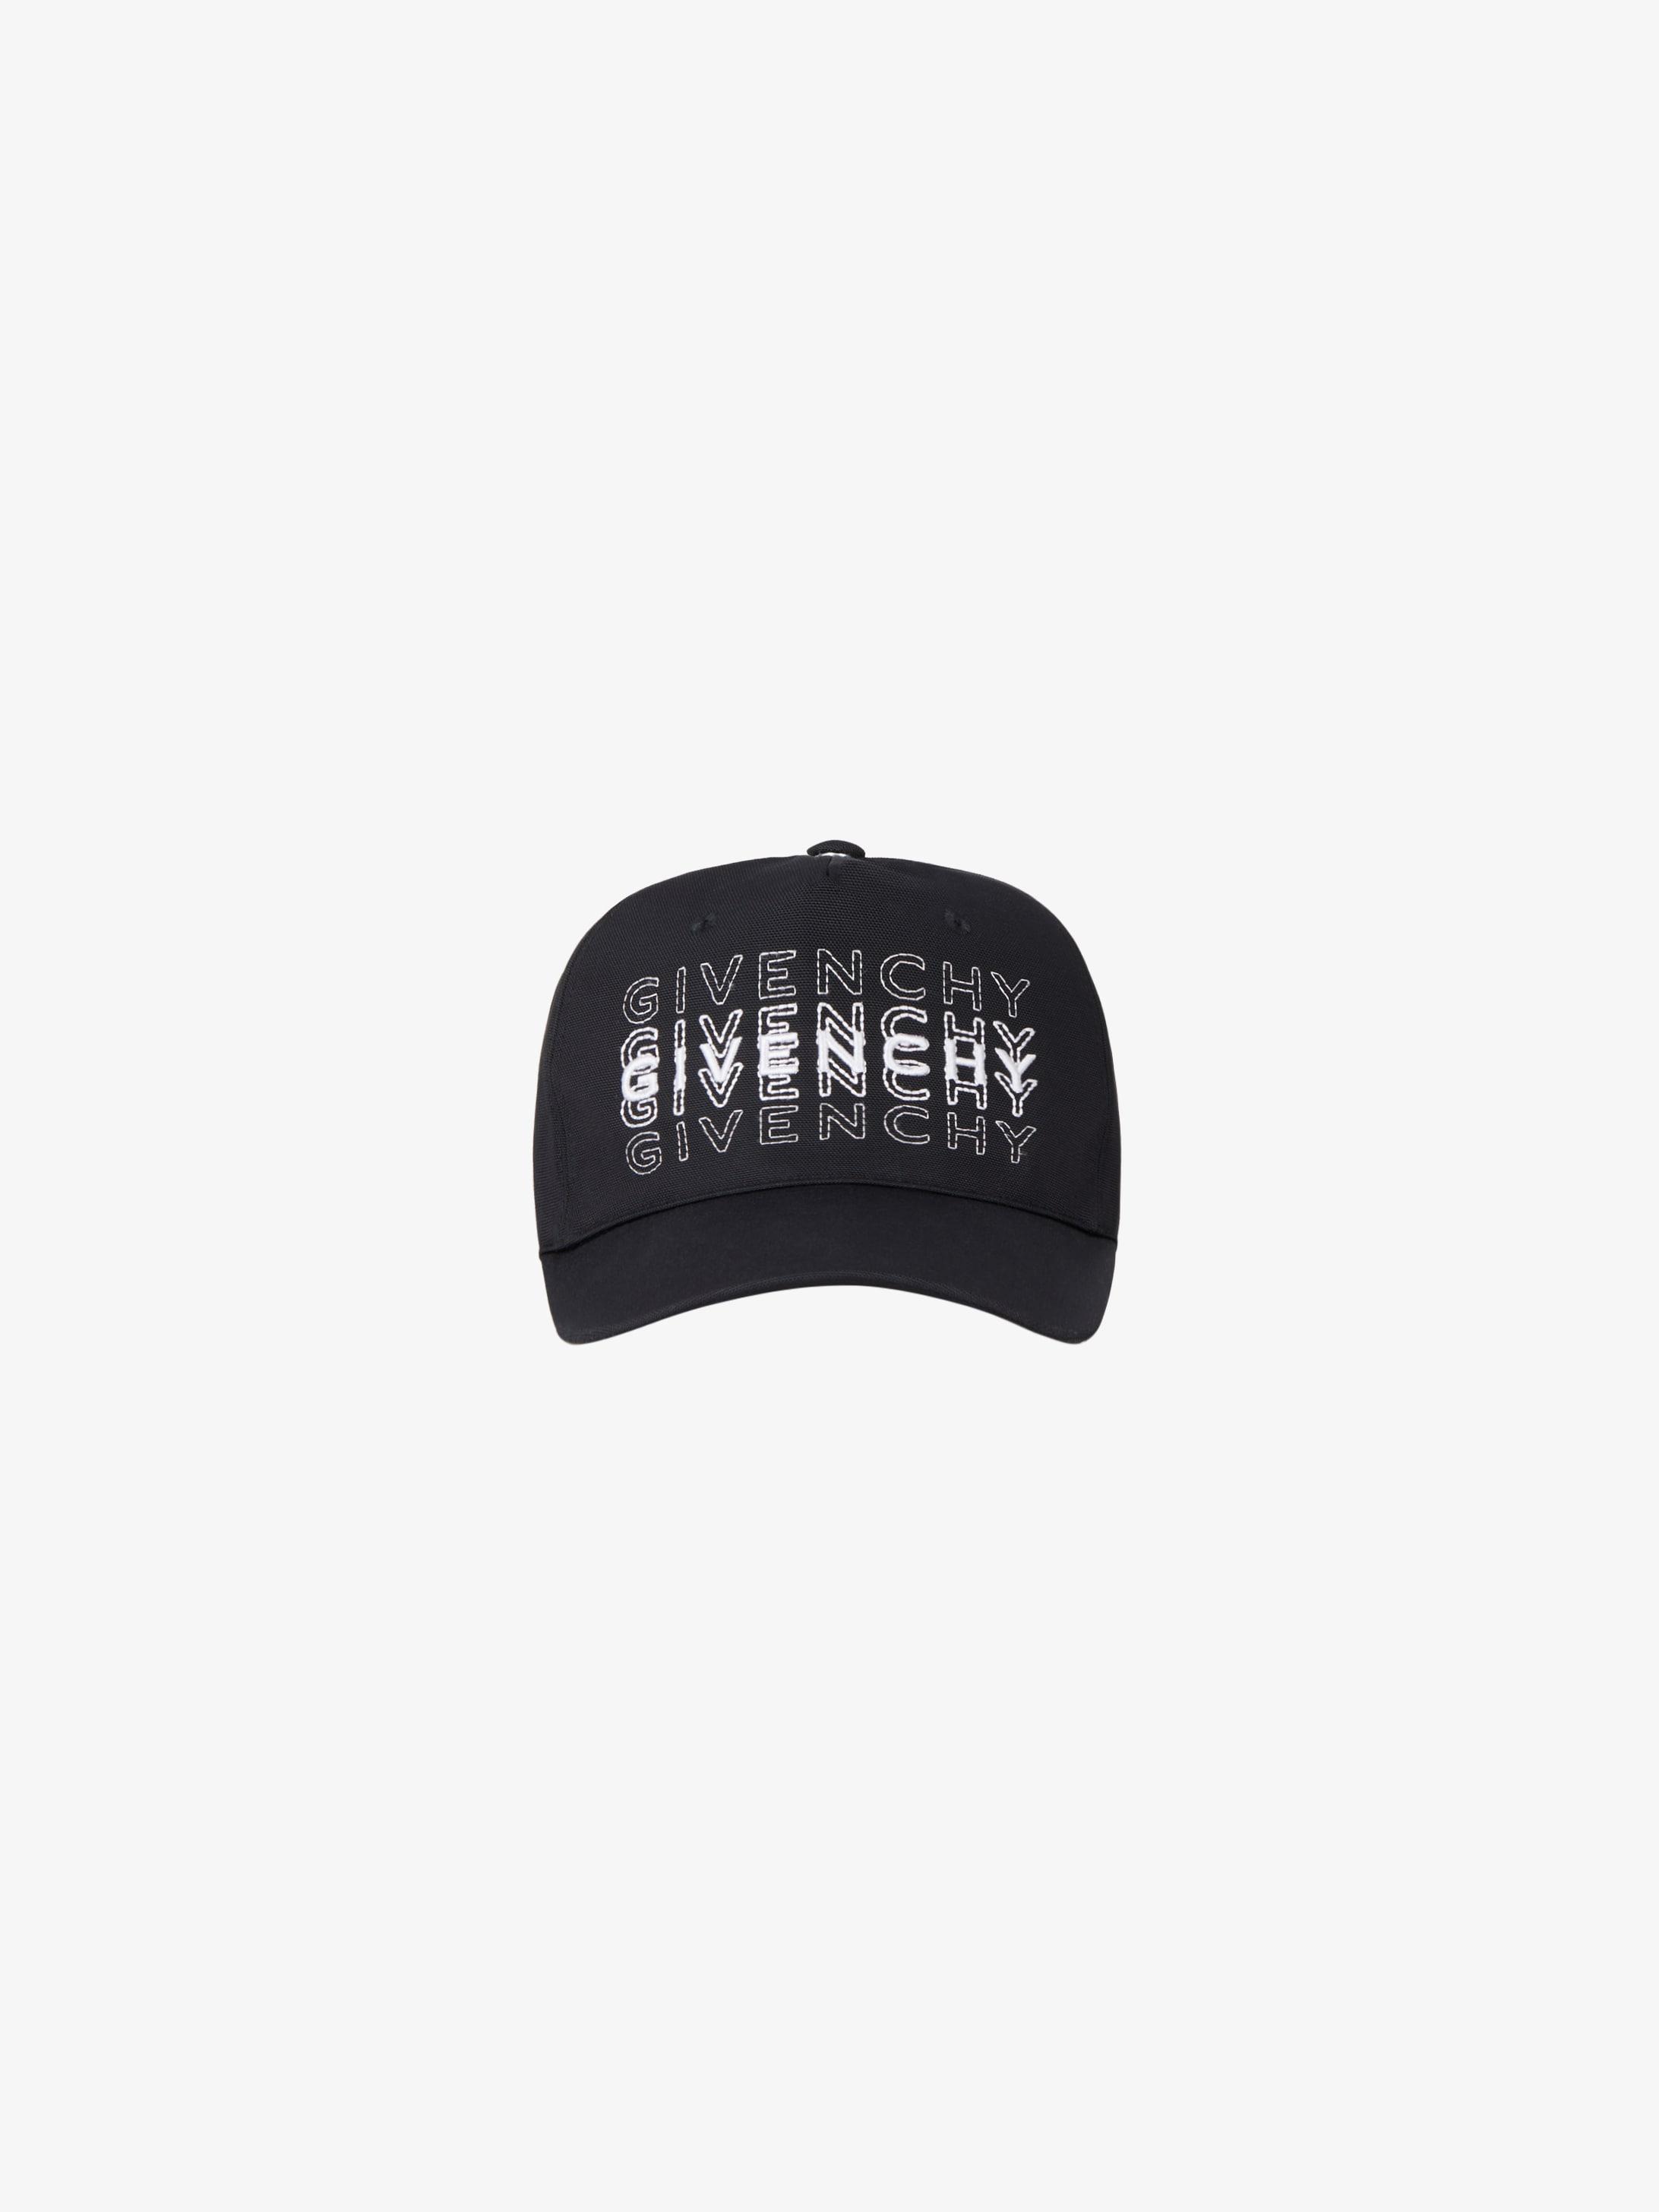 GIVENCHY shading cap